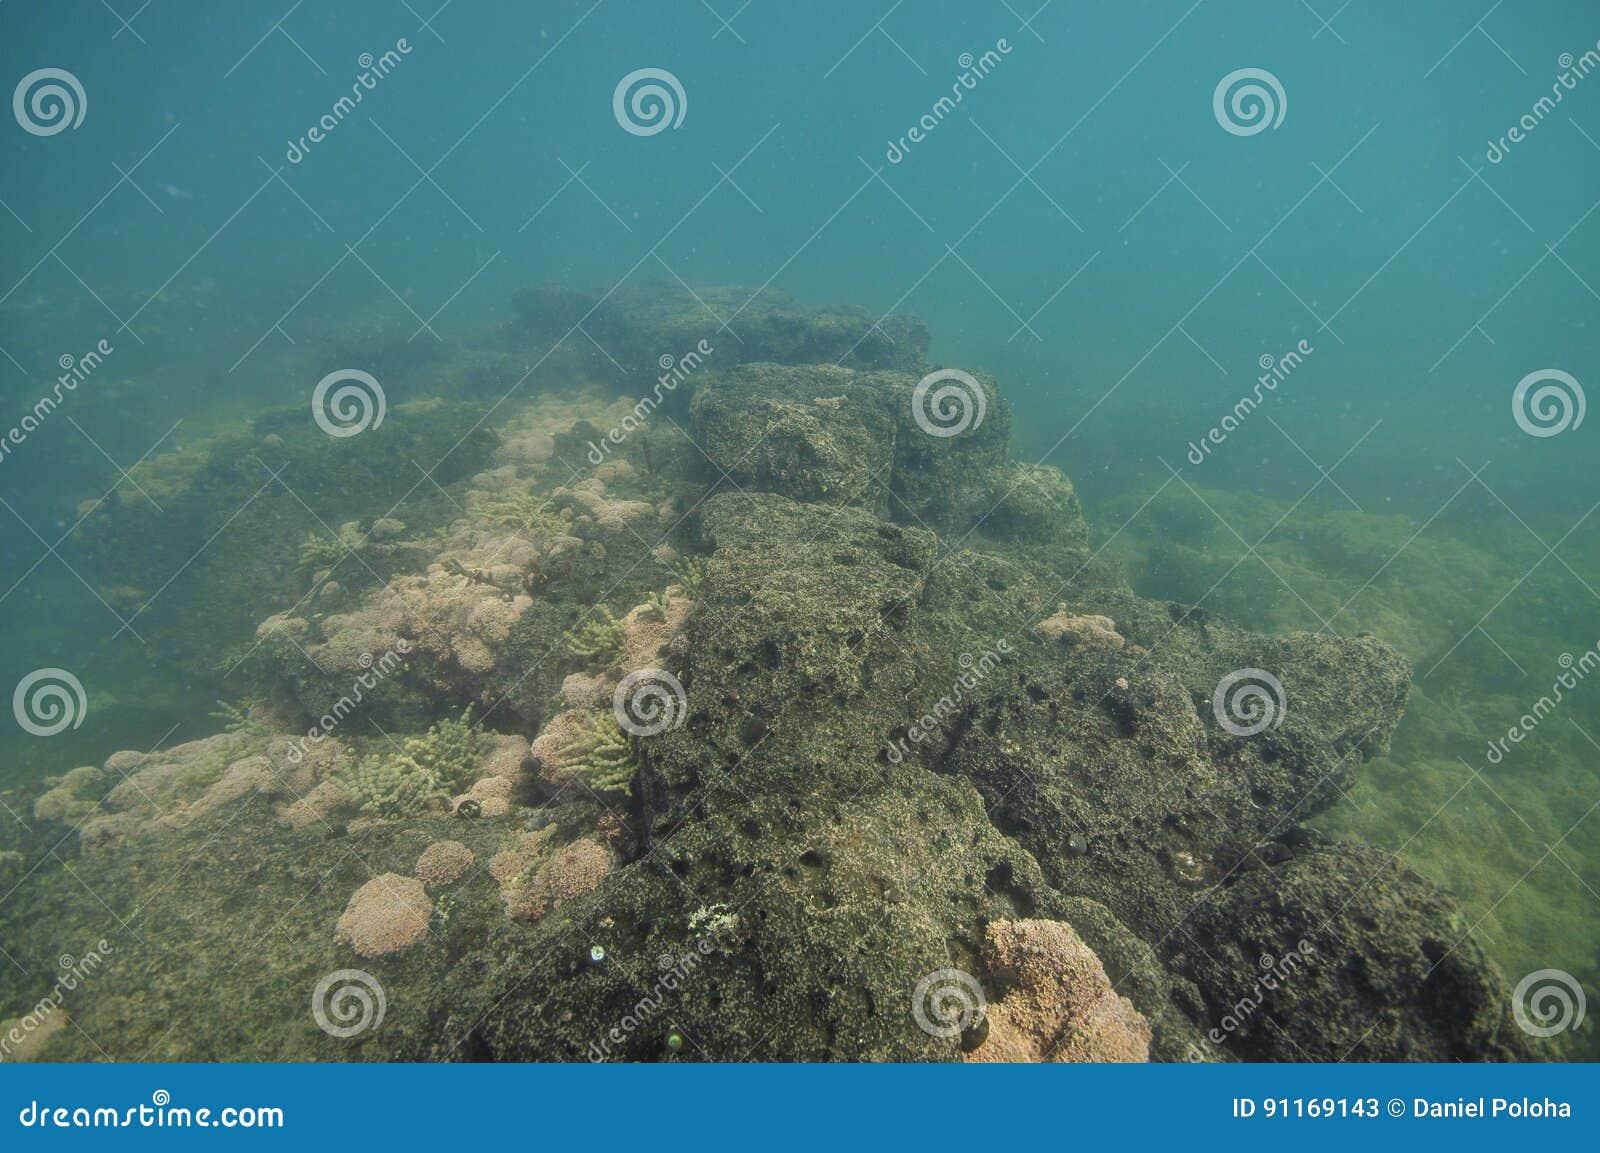 Tidal Rocky Platform Underwater Stock Image - Image of depth